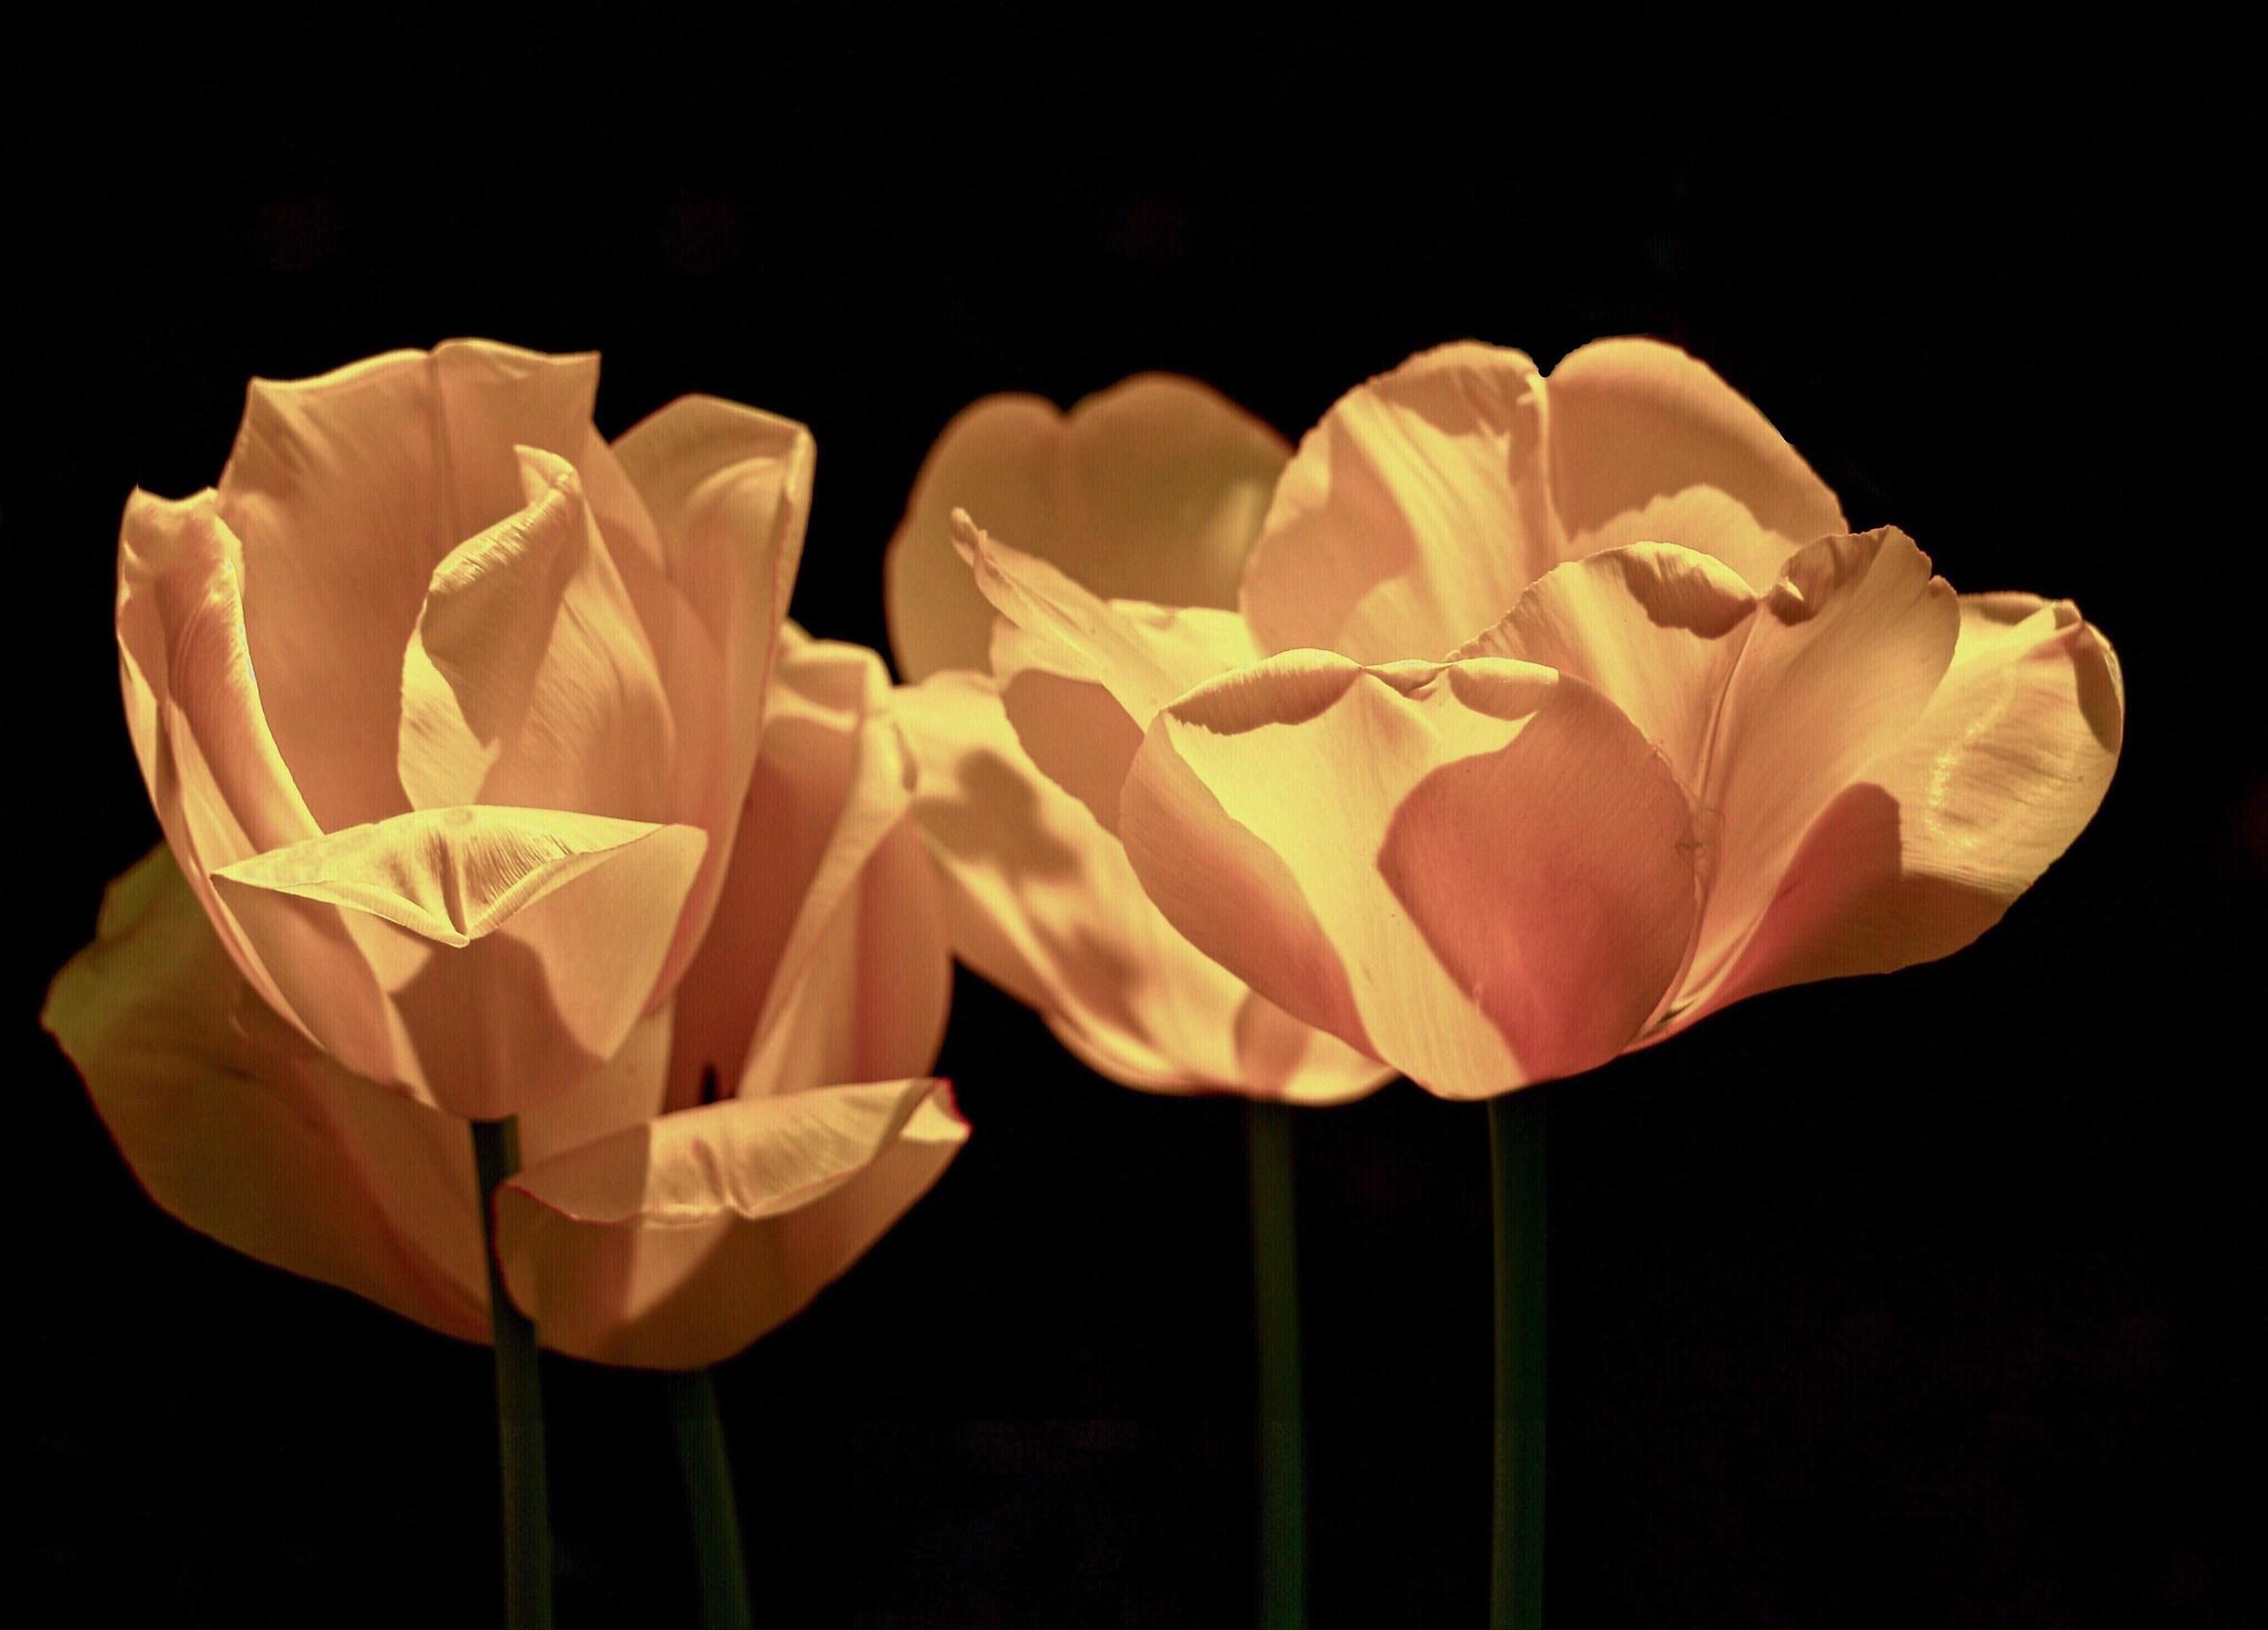 Tulips in light and dark. ...